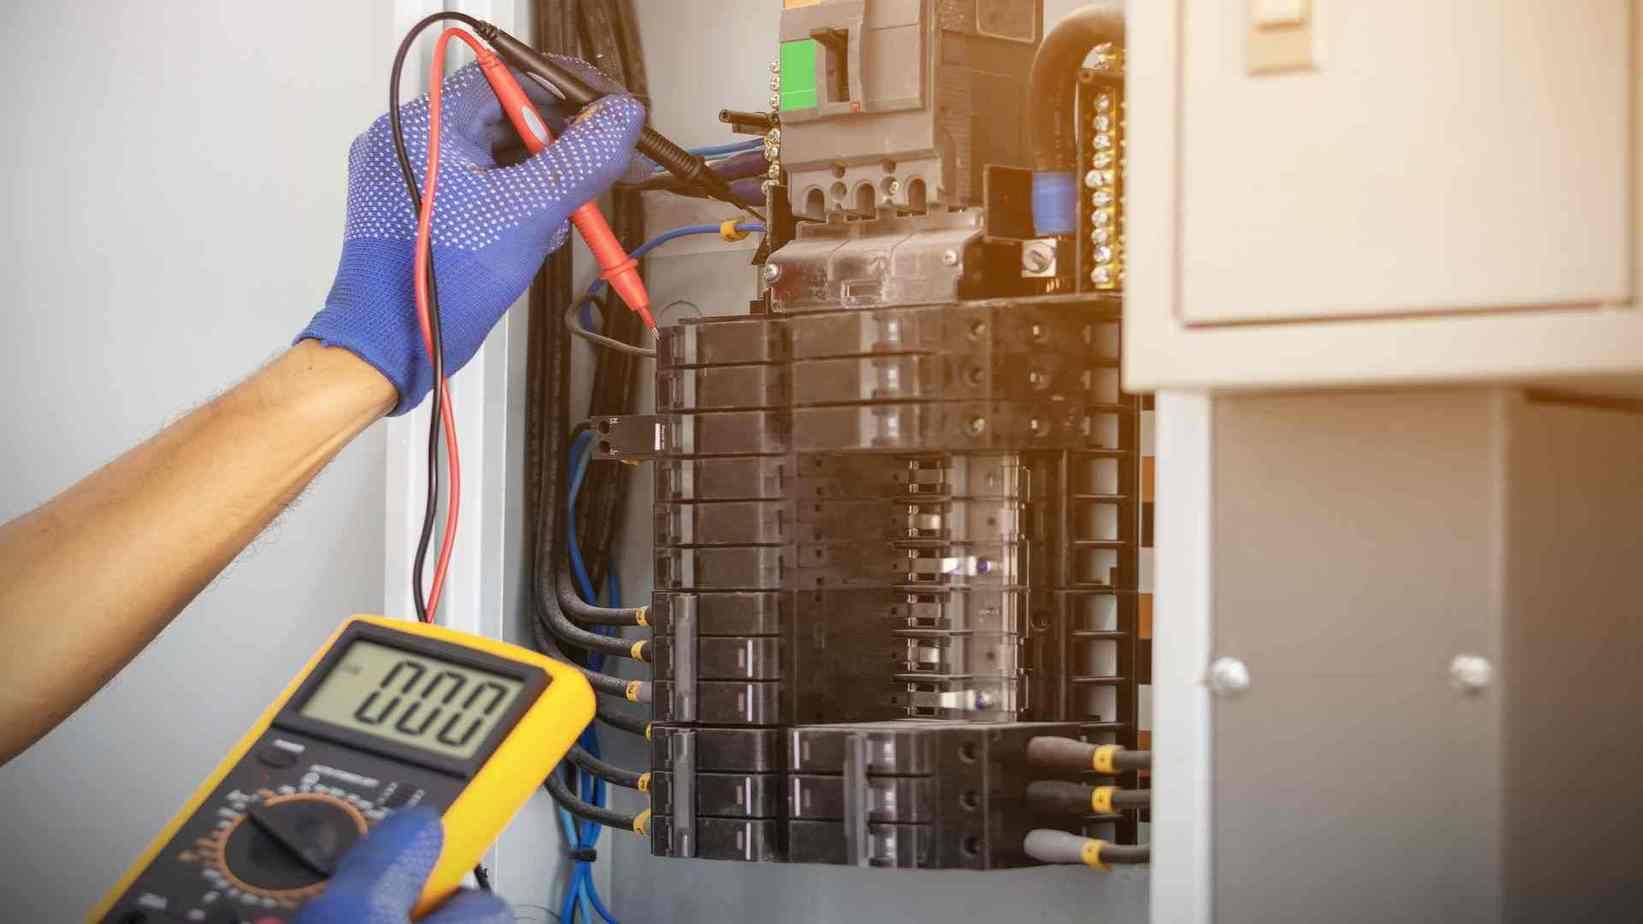 10 Best Voltage Stabilizers In India